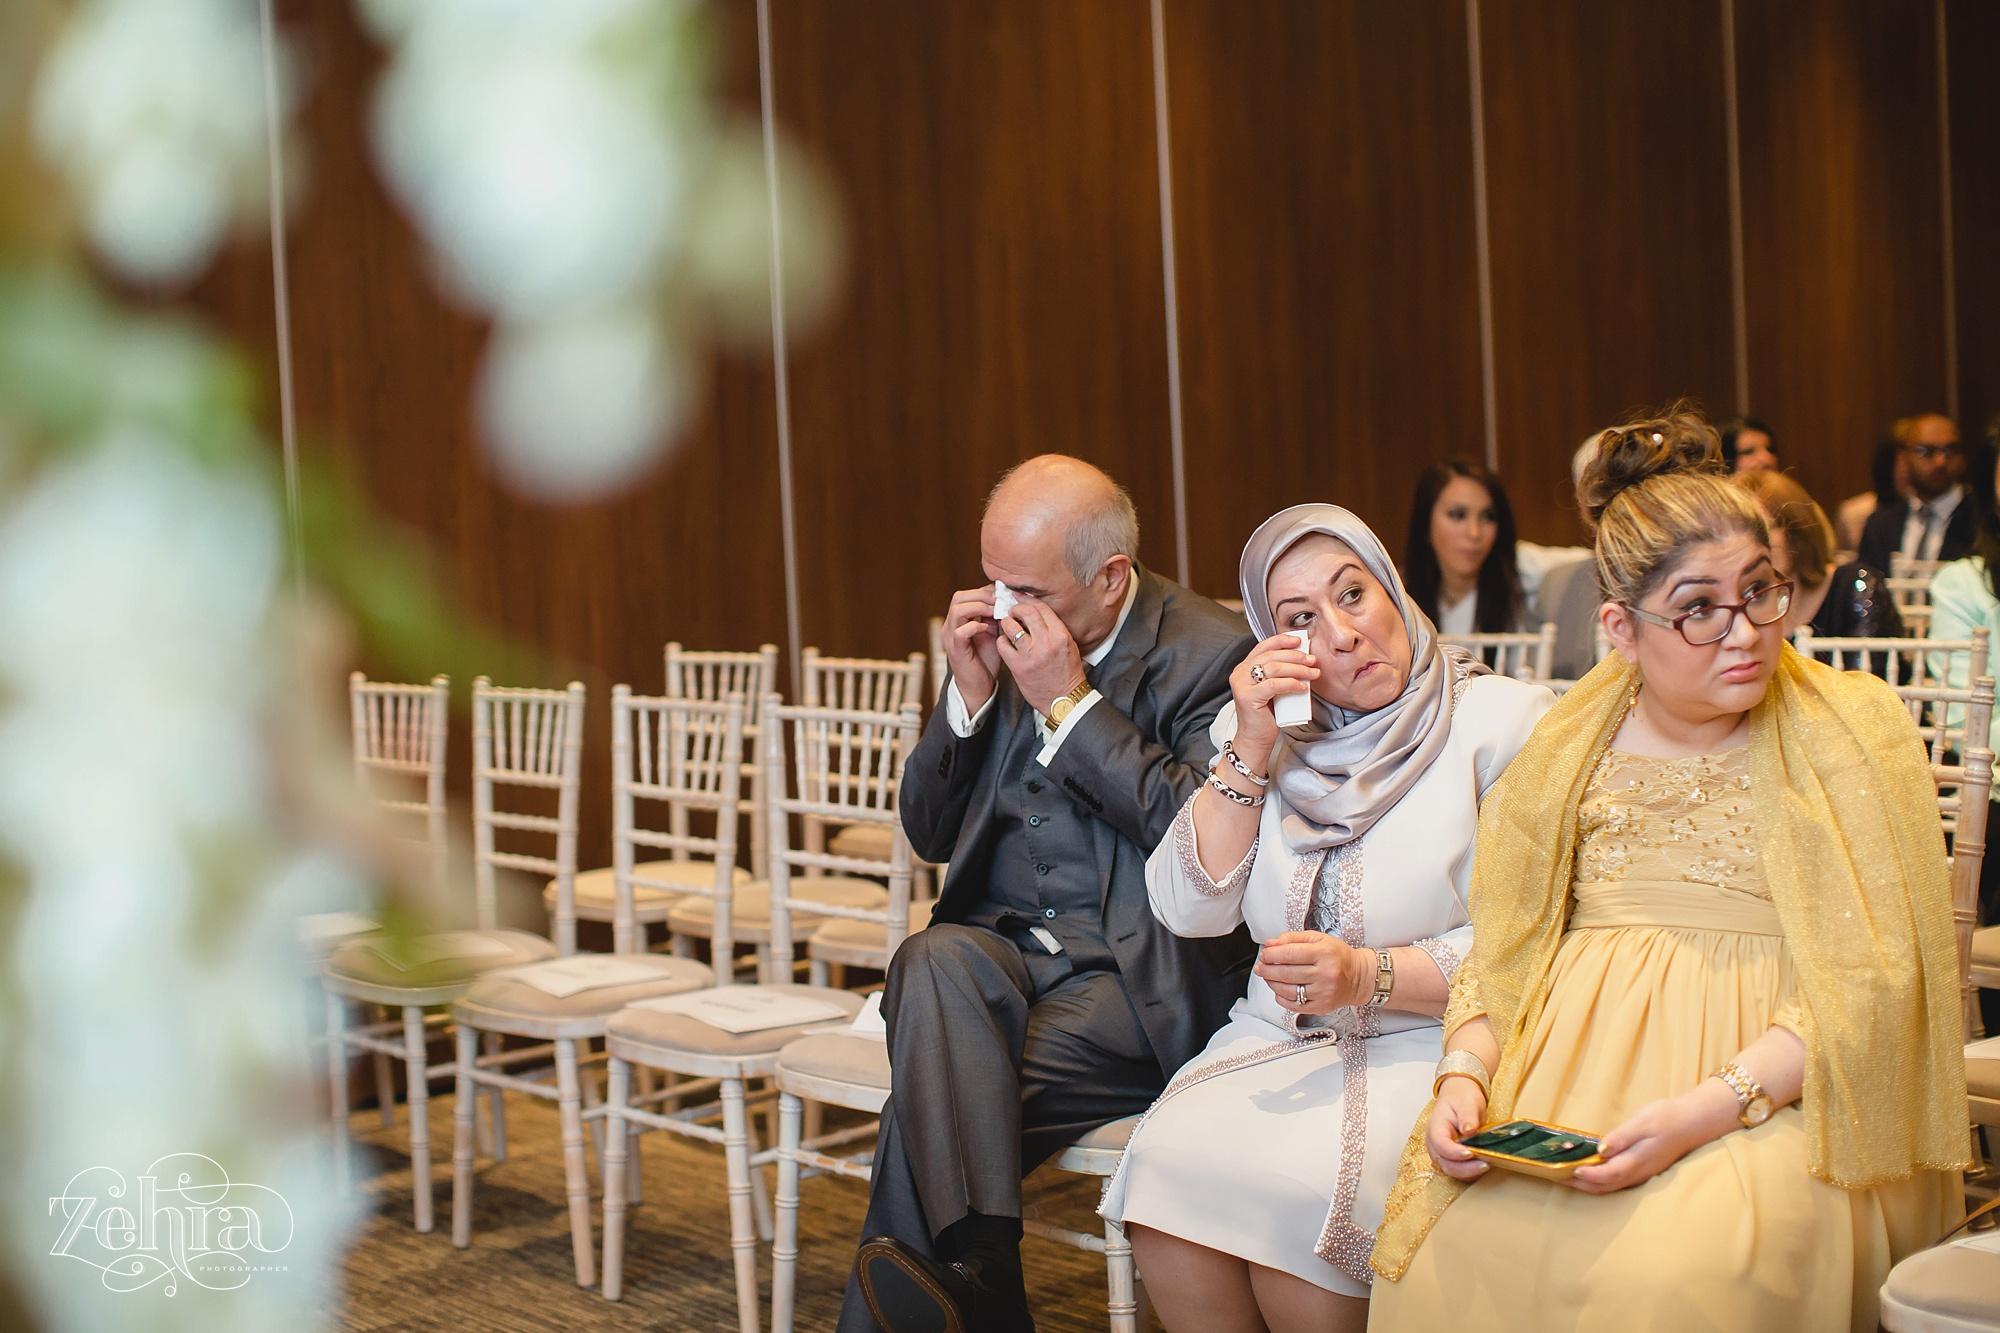 zehra photographer mere cheshire wedding_0014.jpg